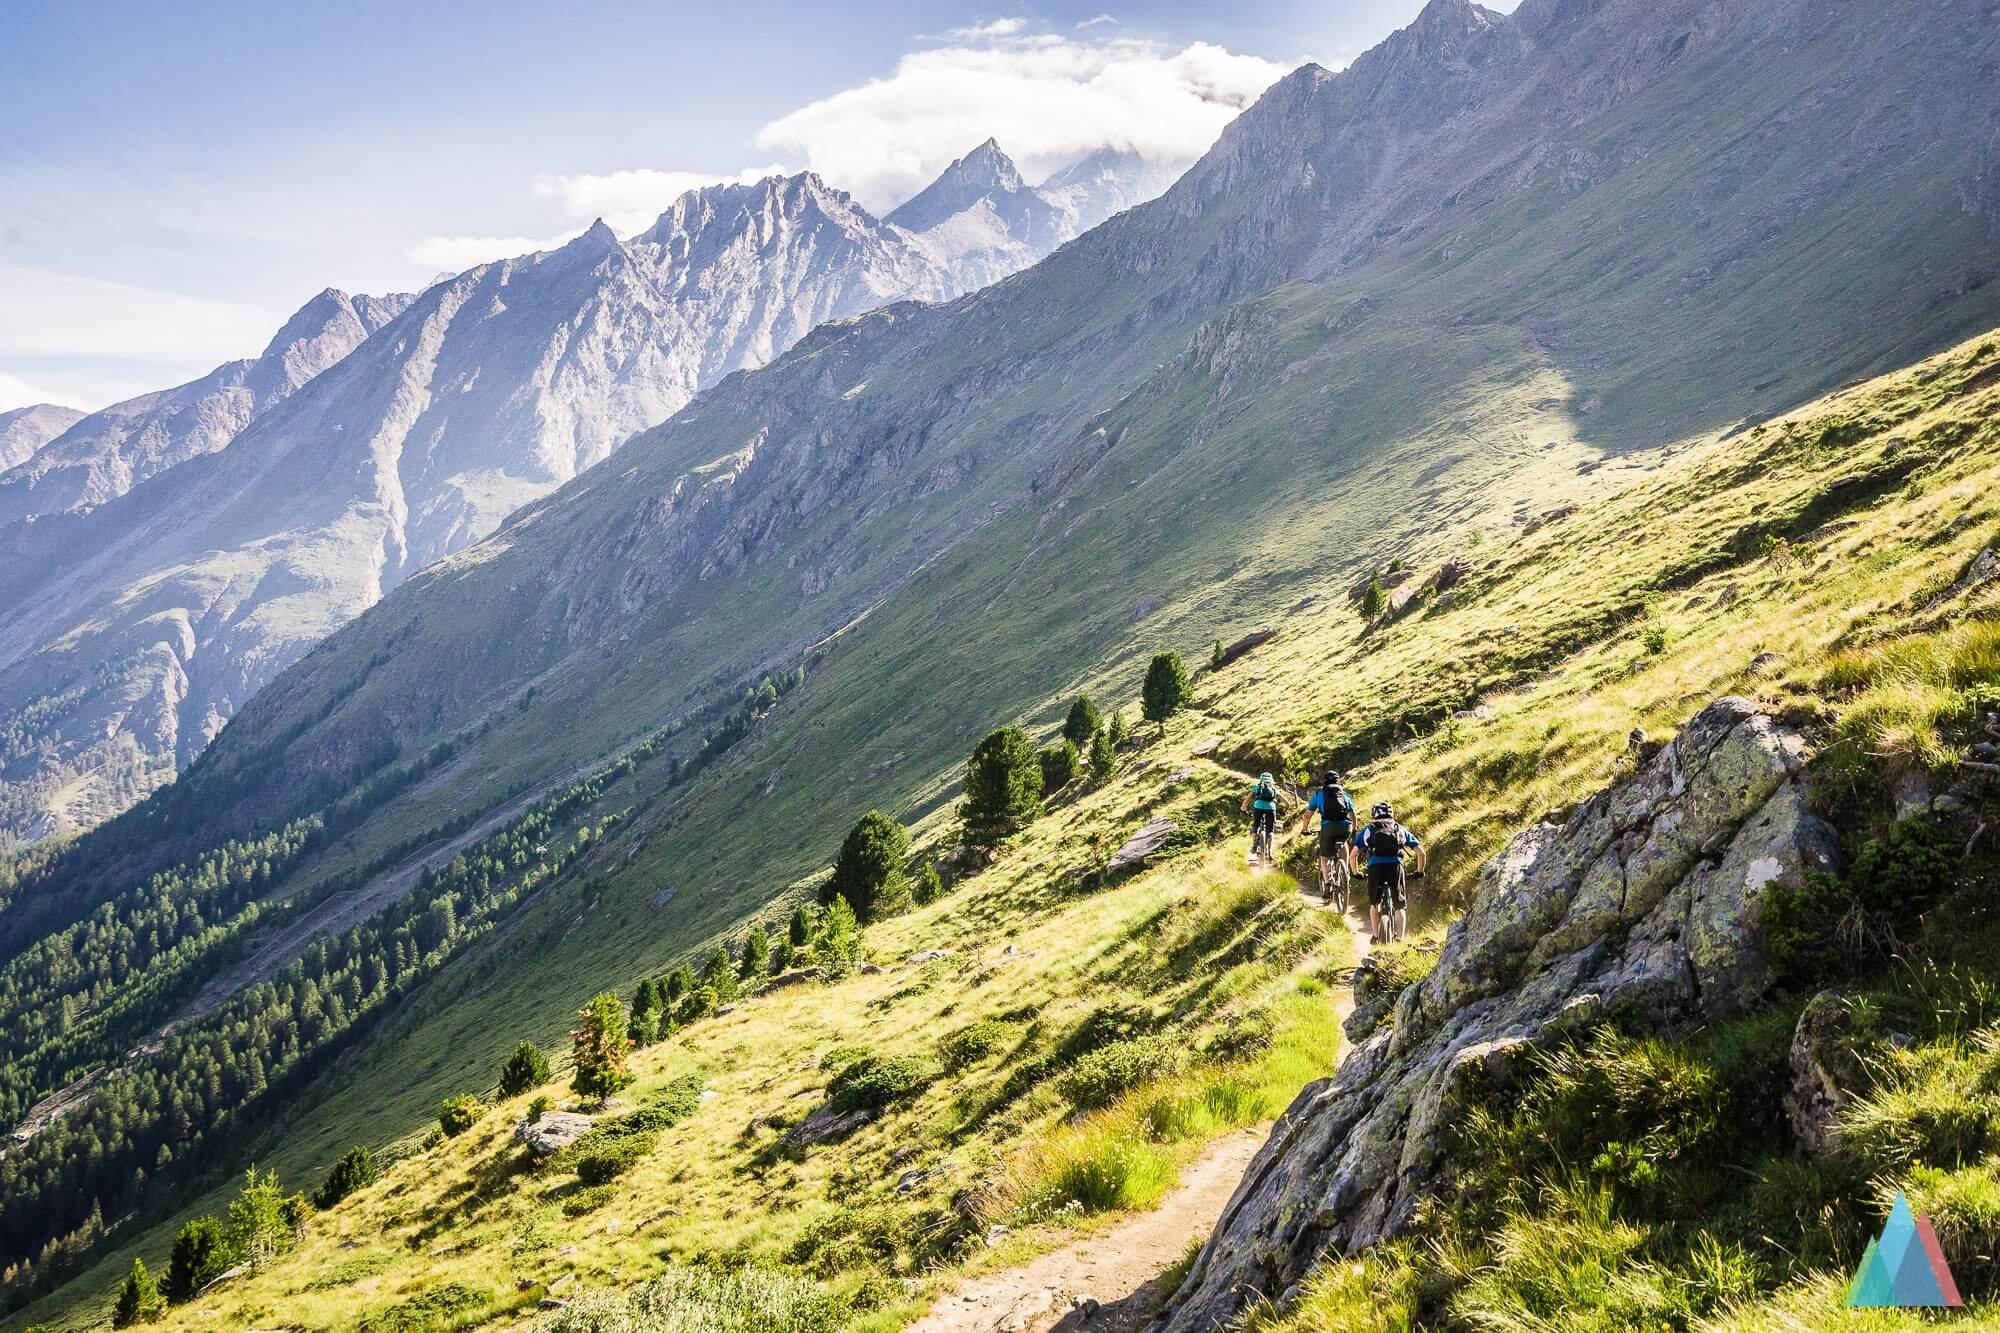 zermatt-bike-trail-europaweg-täsch